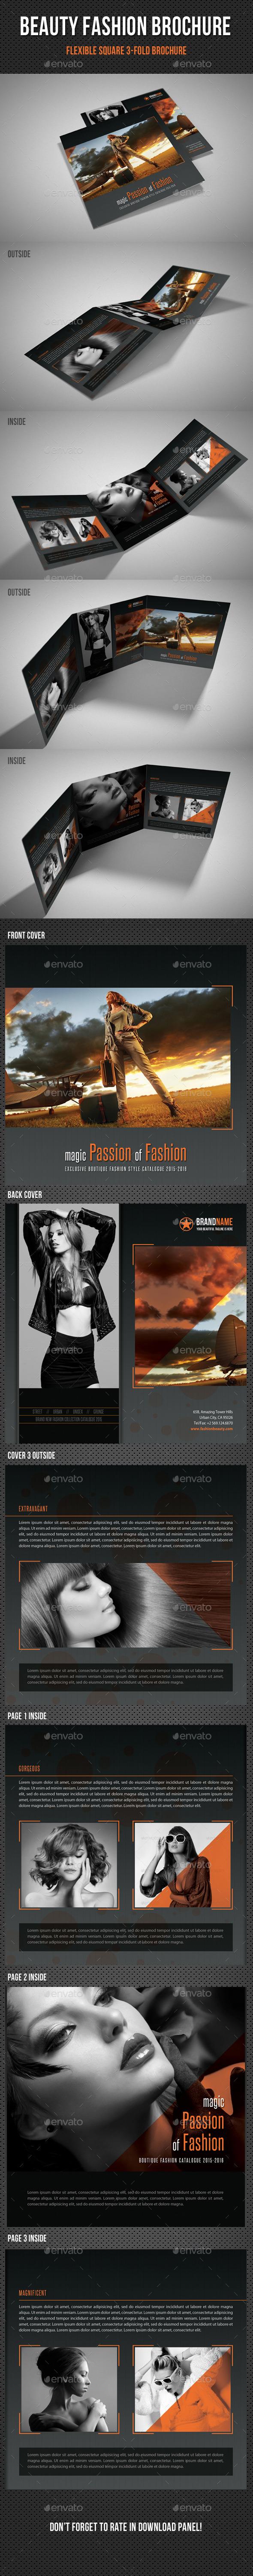 GraphicRiver Beauty Fashion Square 3-Fold Brochure 04 11406620